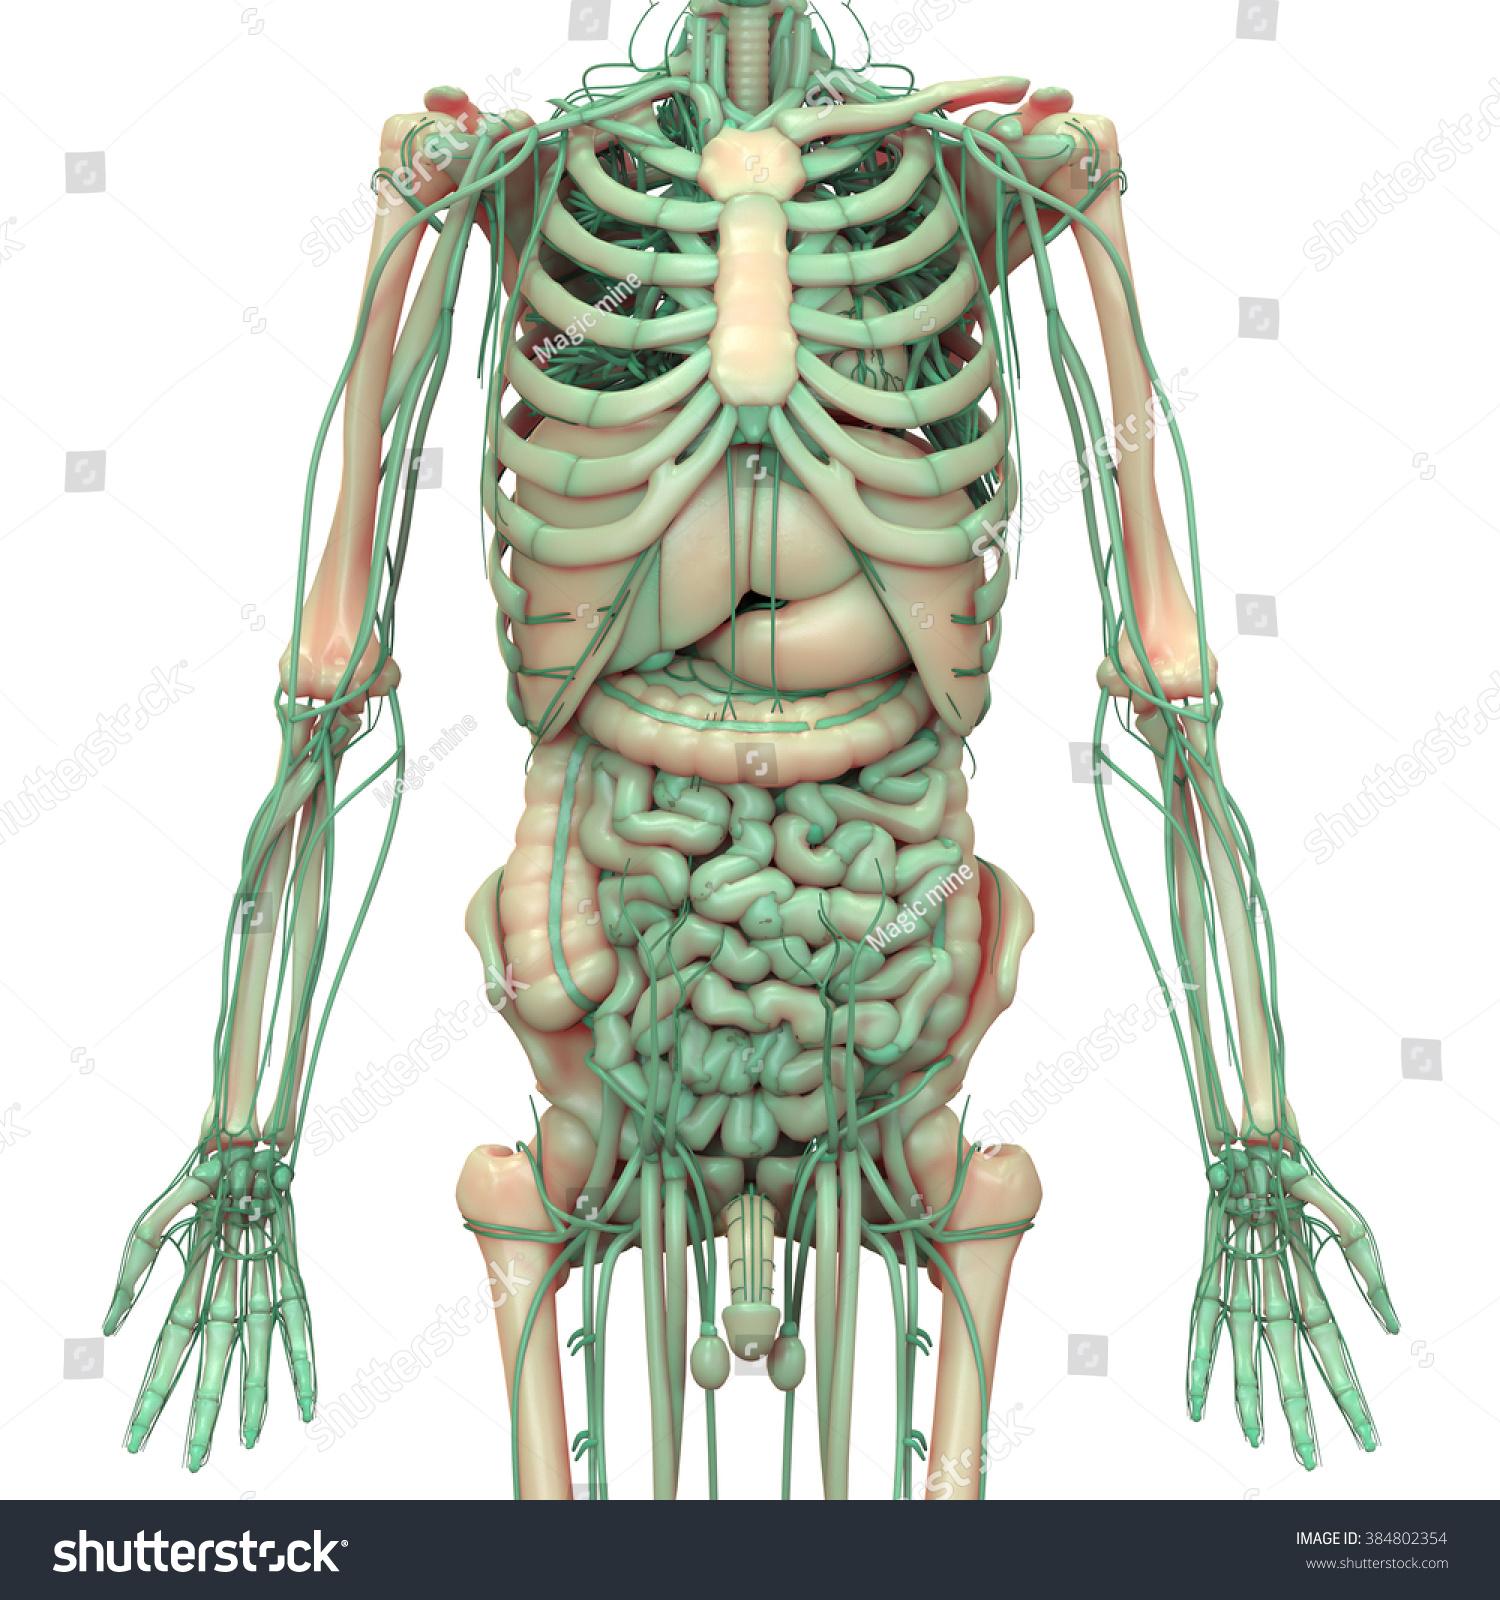 Human Body Anatomy Brain Lungs Heart Stock Illustration 384802354 ...